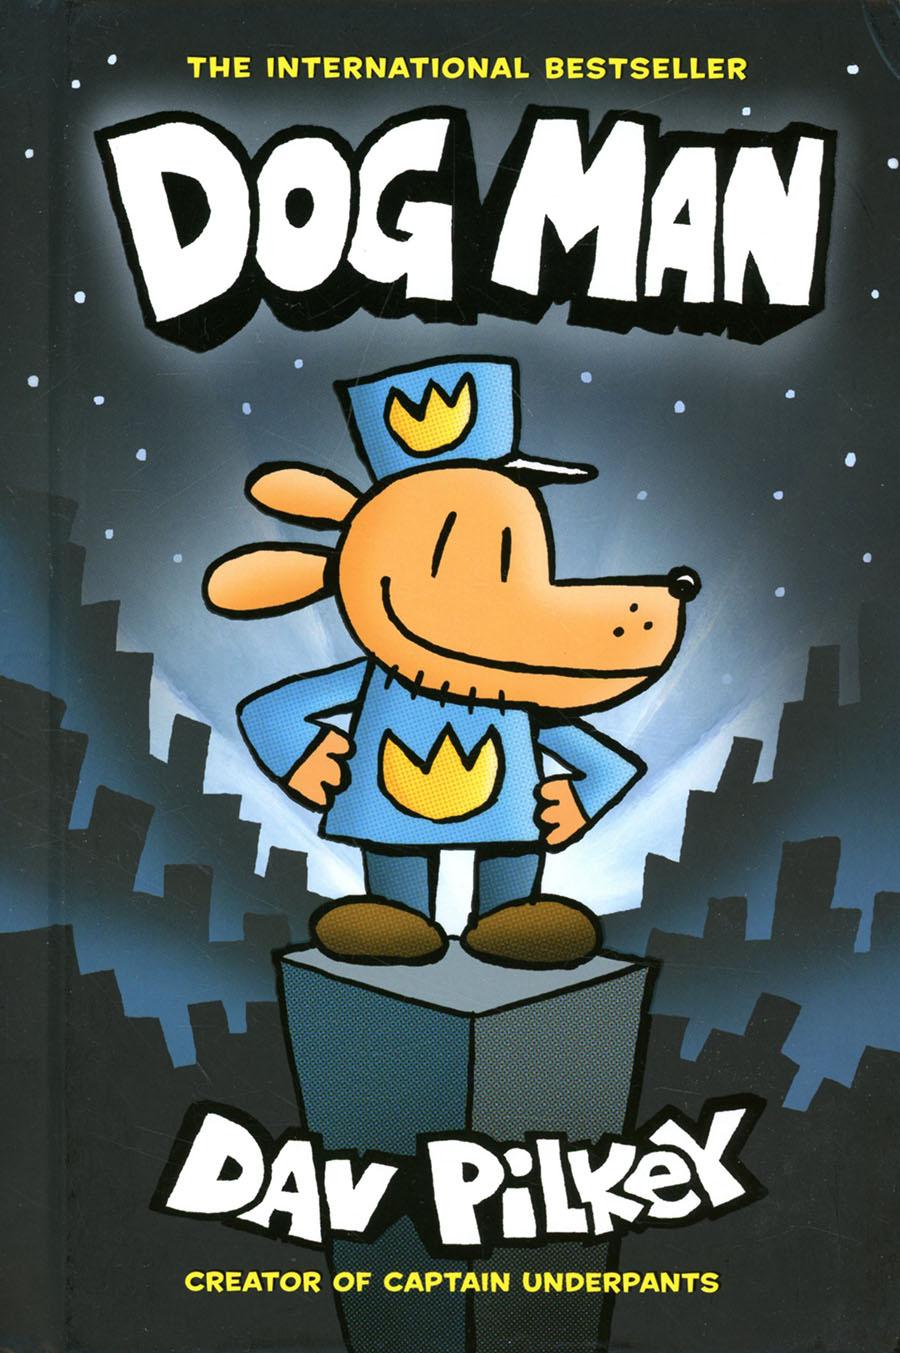 Dog Man Vol 1 HC New Printing Foil-Enhanced Cover